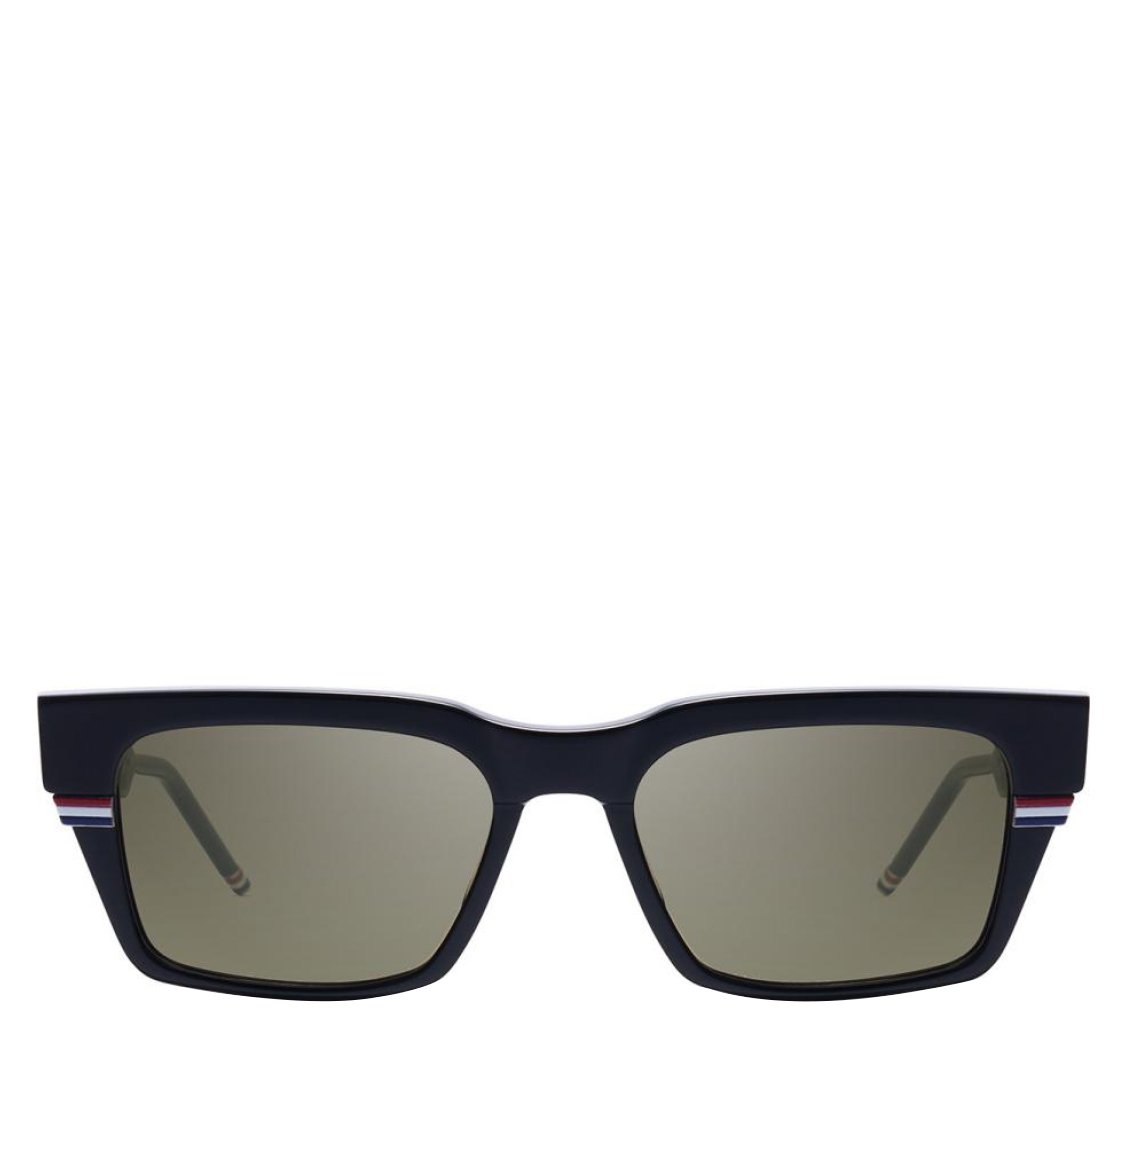 Thom Browne 52 Square Frame Black Sunglasses Γυαλιά Ηλίου